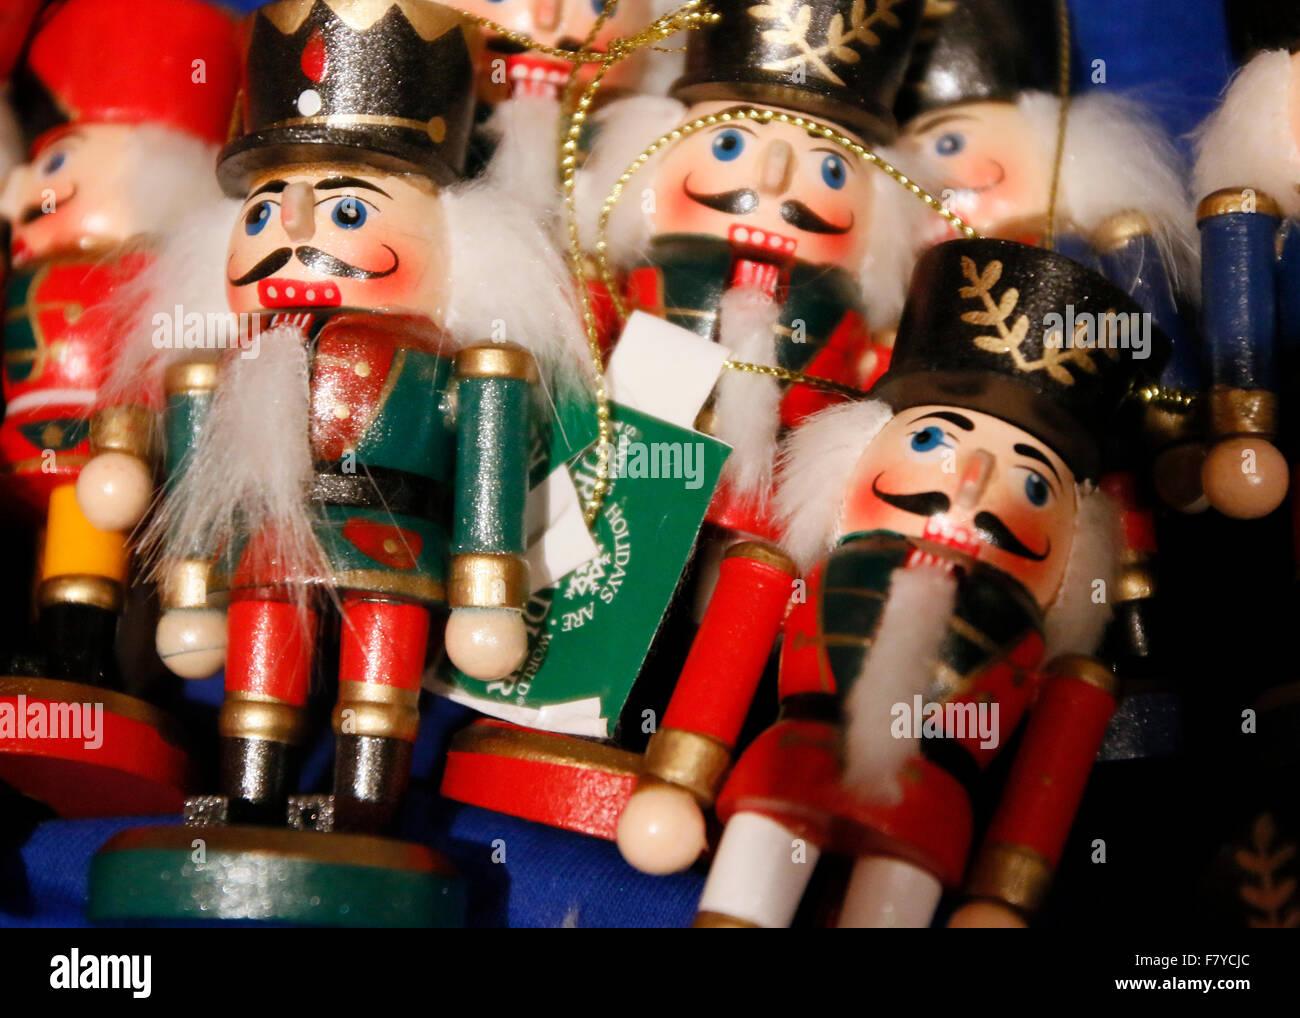 Christmas ornaments; nutcrackers Stock Photo: 90957060 - Alamy